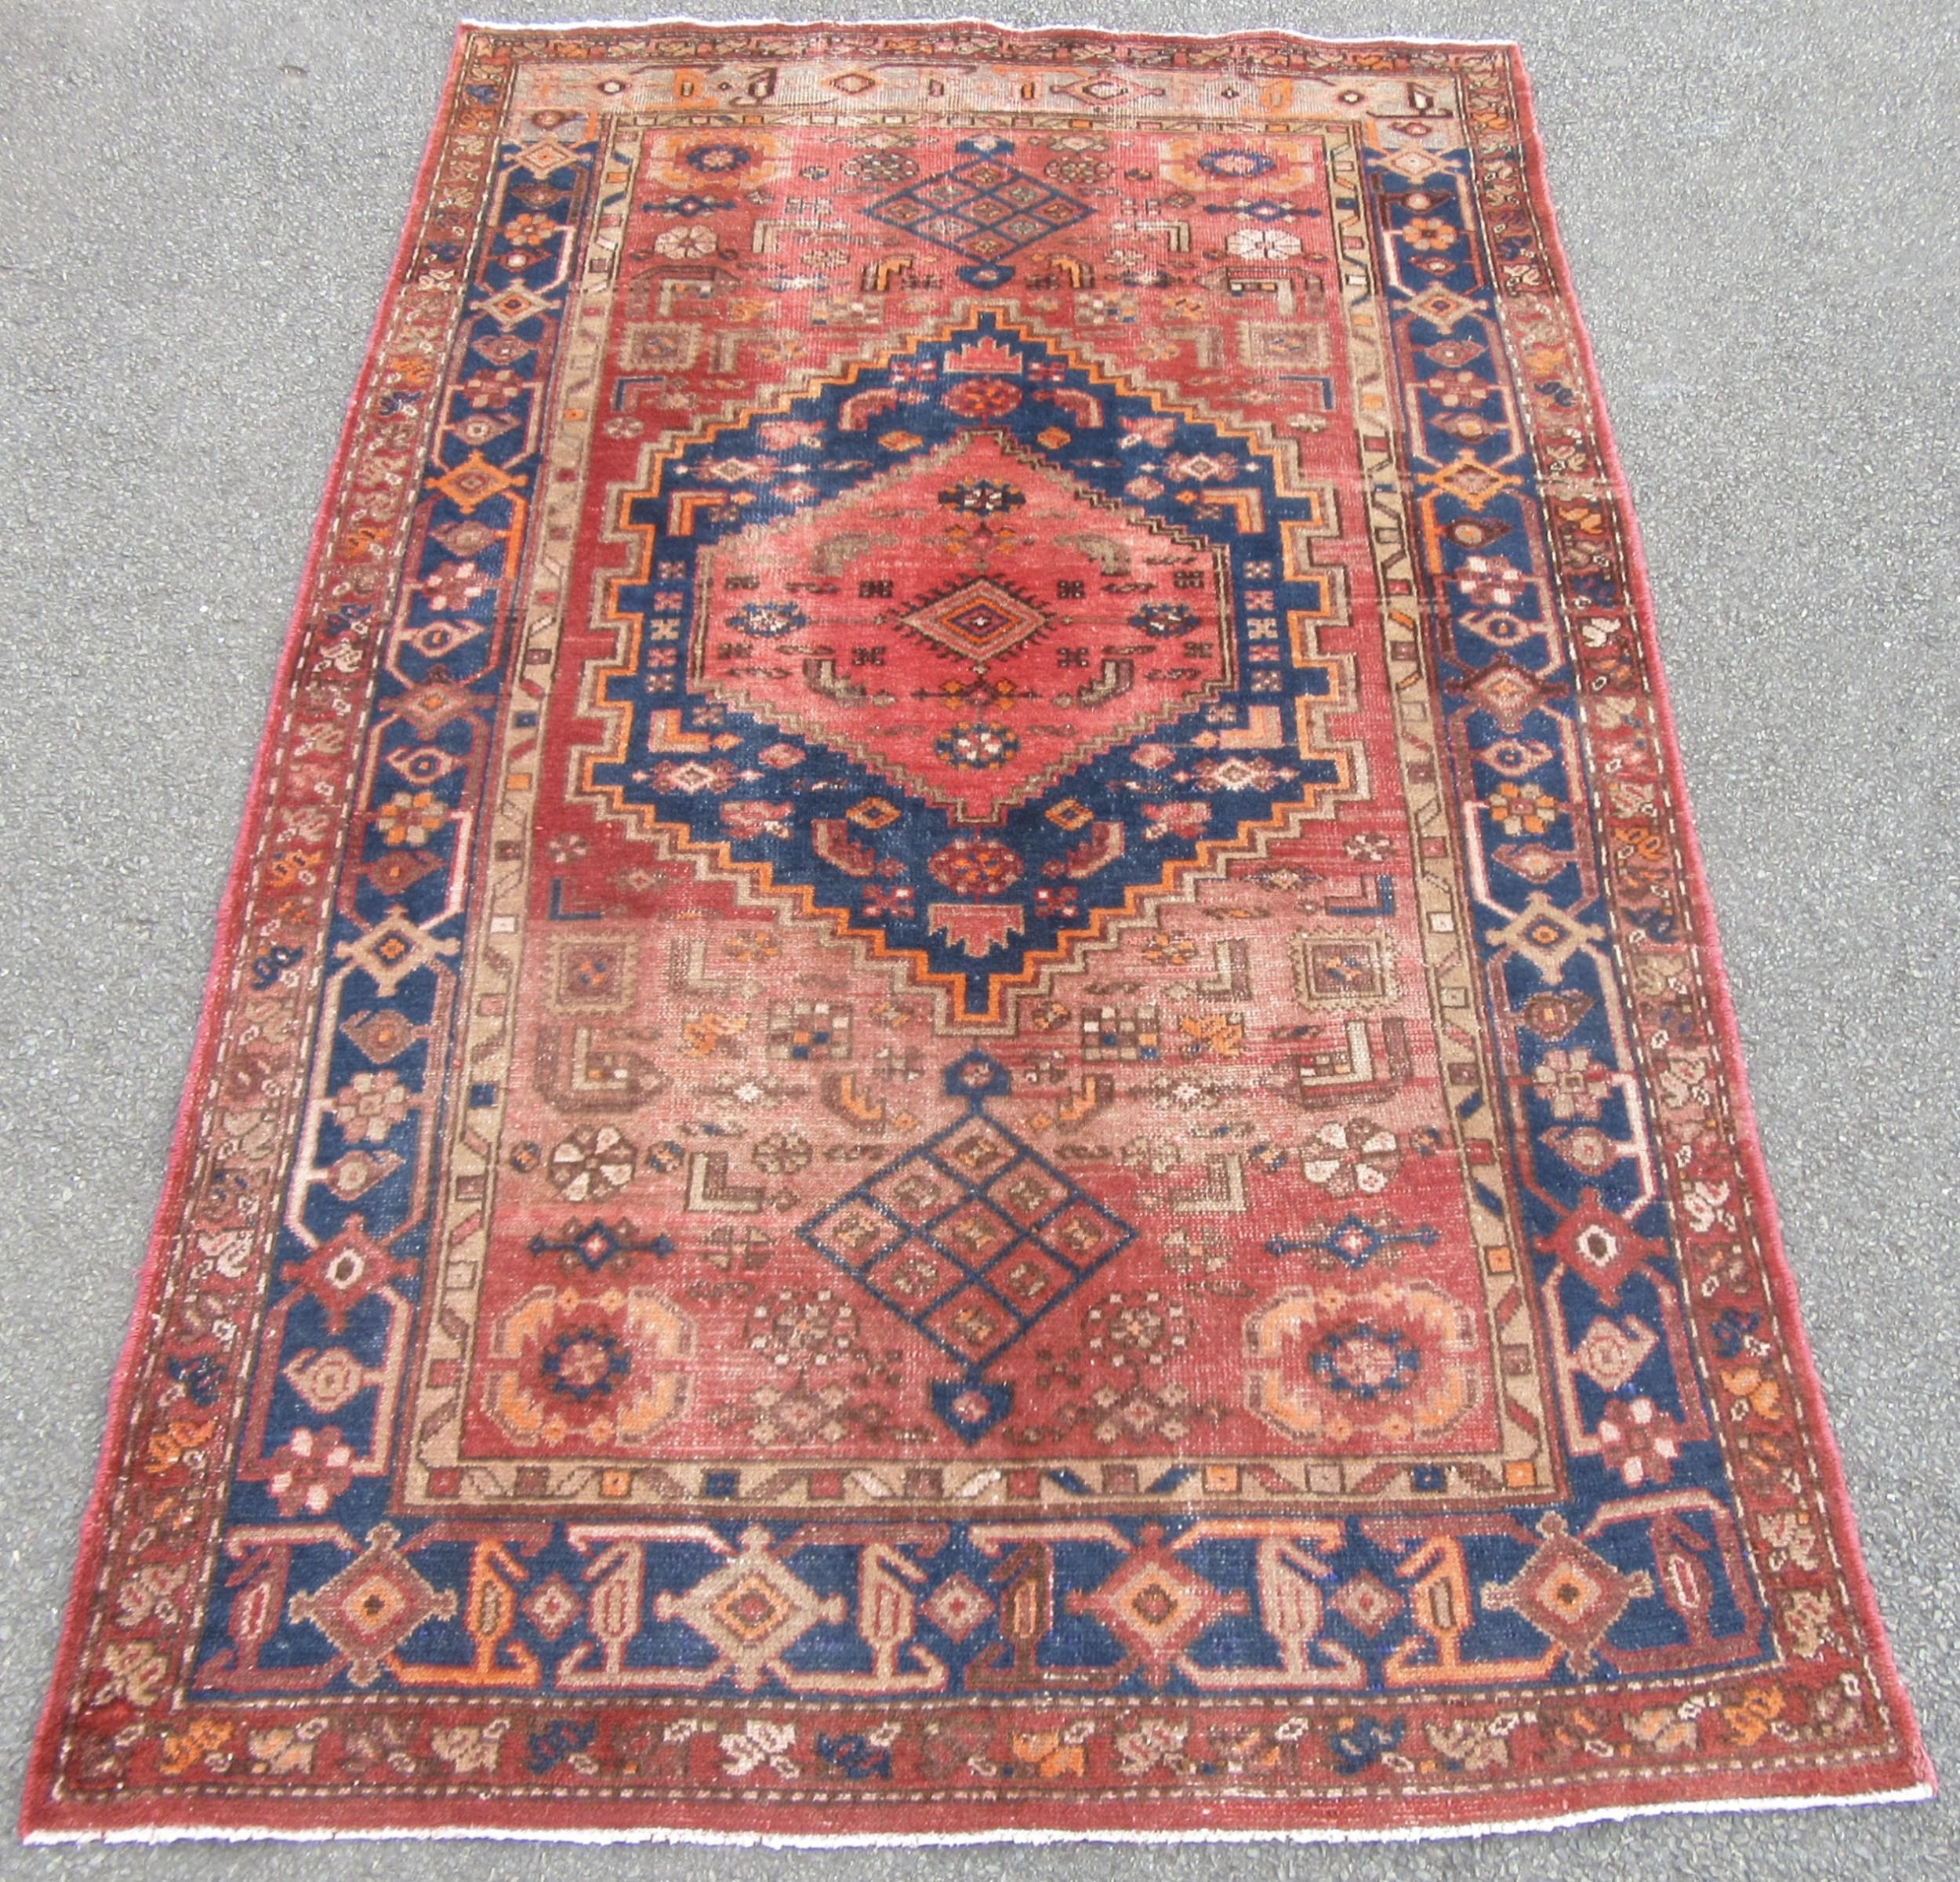 antique country house shabby chic persian hamadan rug antique persian kurdistan rug 218cm x 138cm